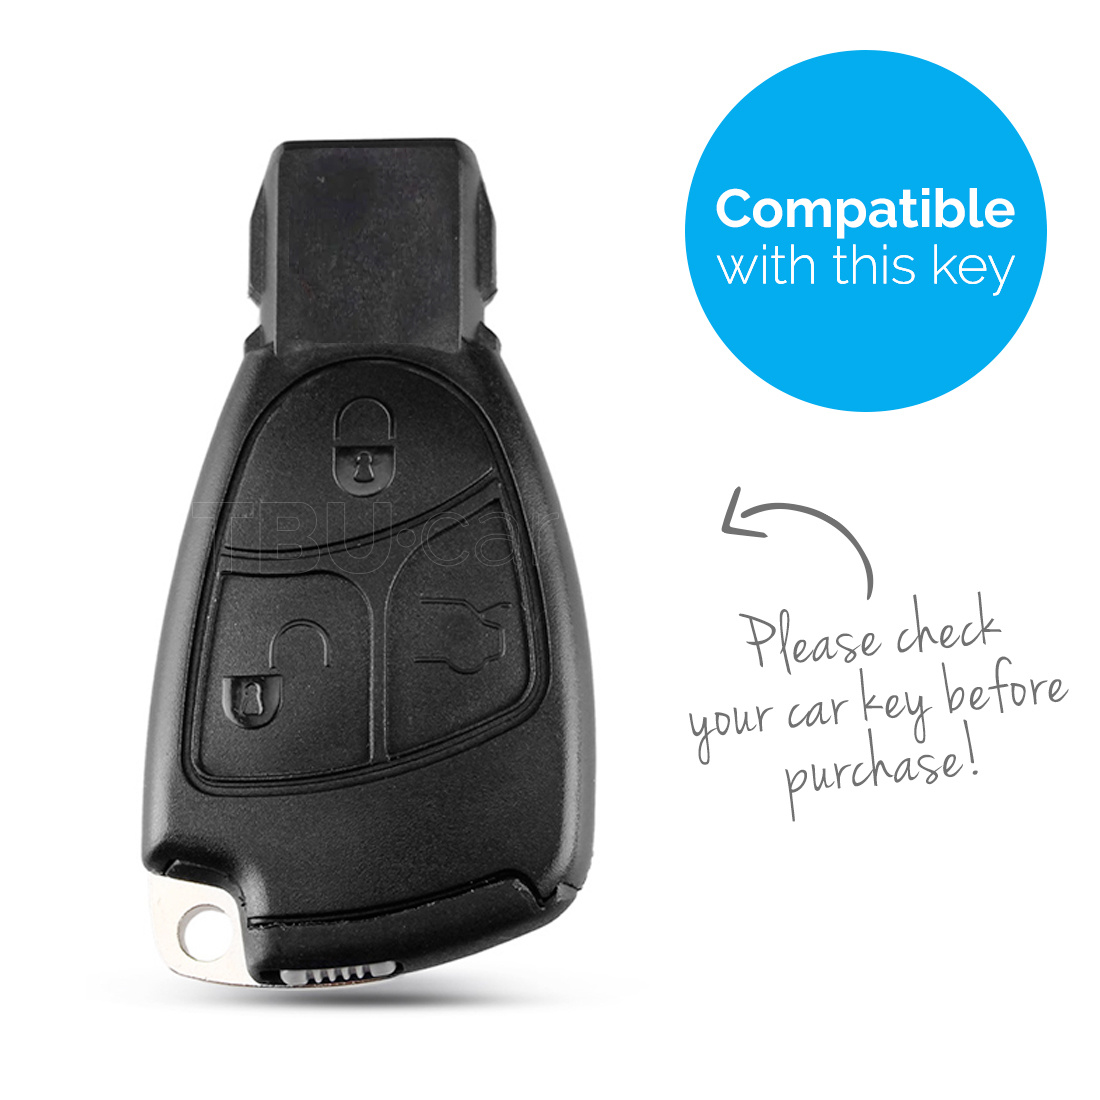 TBU car TBU car Sleutel cover compatibel met Mercedes - Silicone sleutelhoesje - beschermhoesje autosleutel - Wit